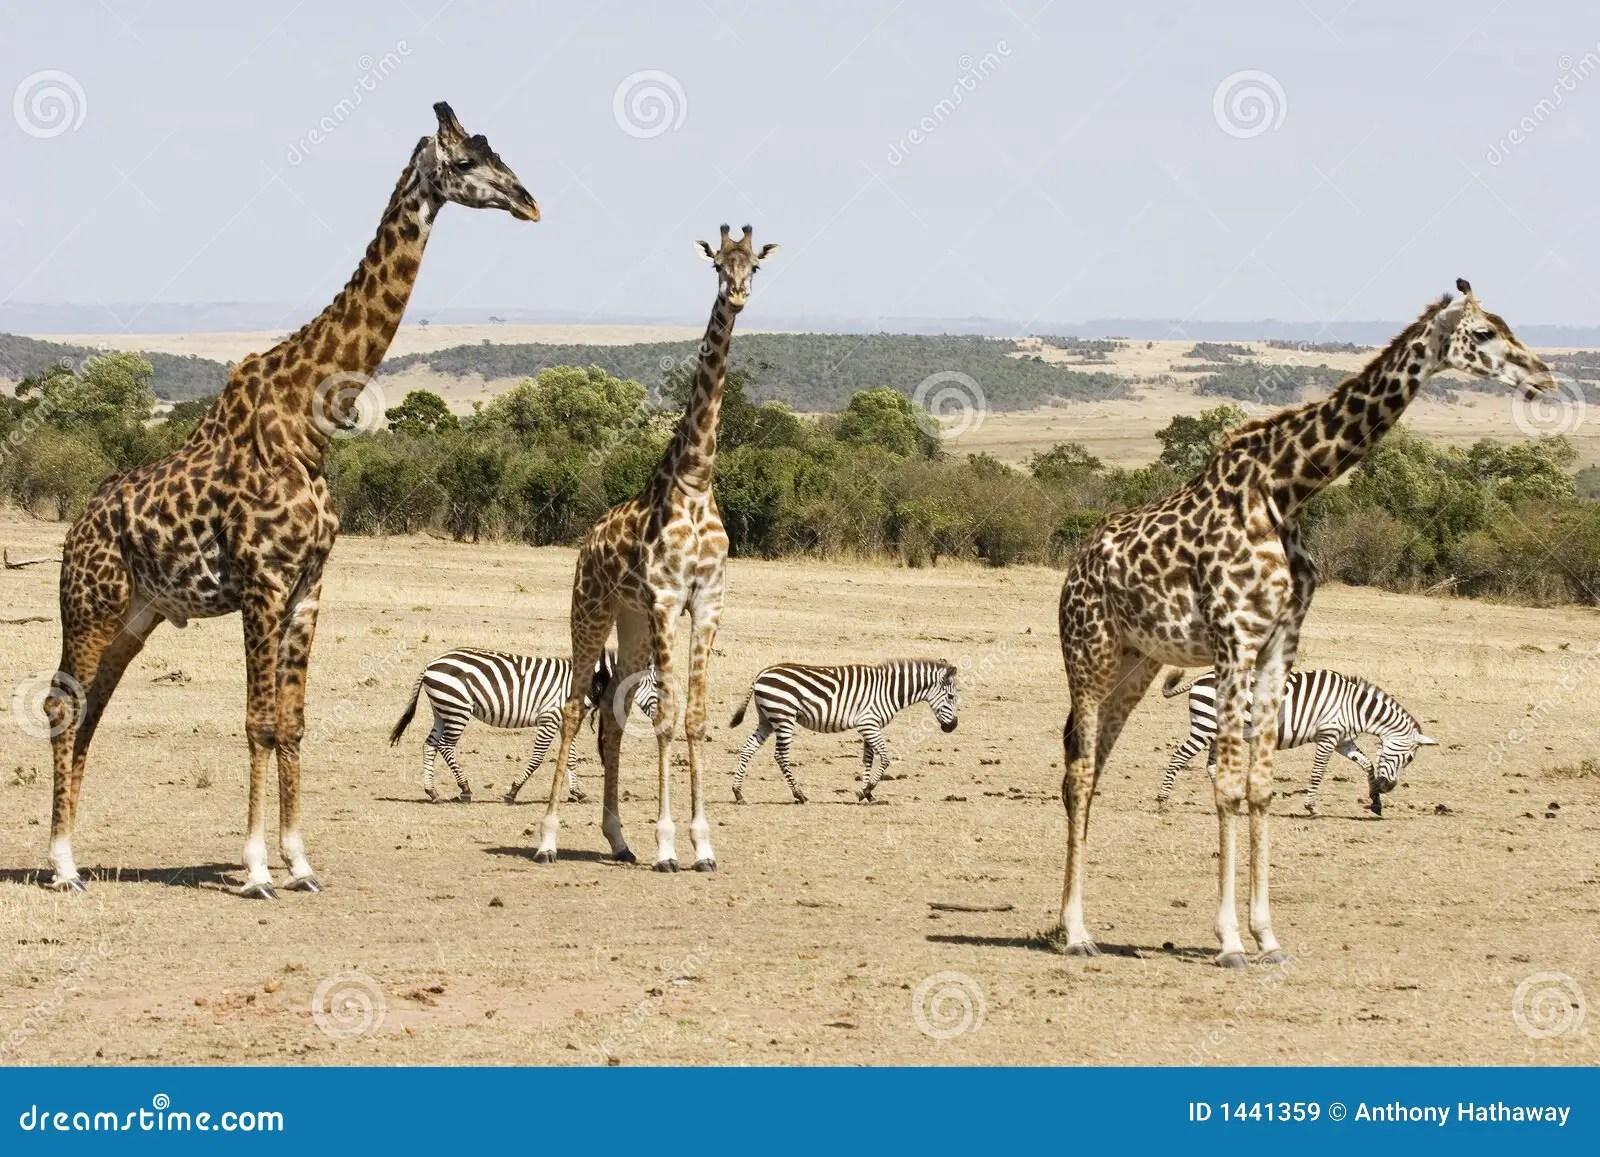 Giraffes And Zebras Stock Image Image Of Zebras Africa